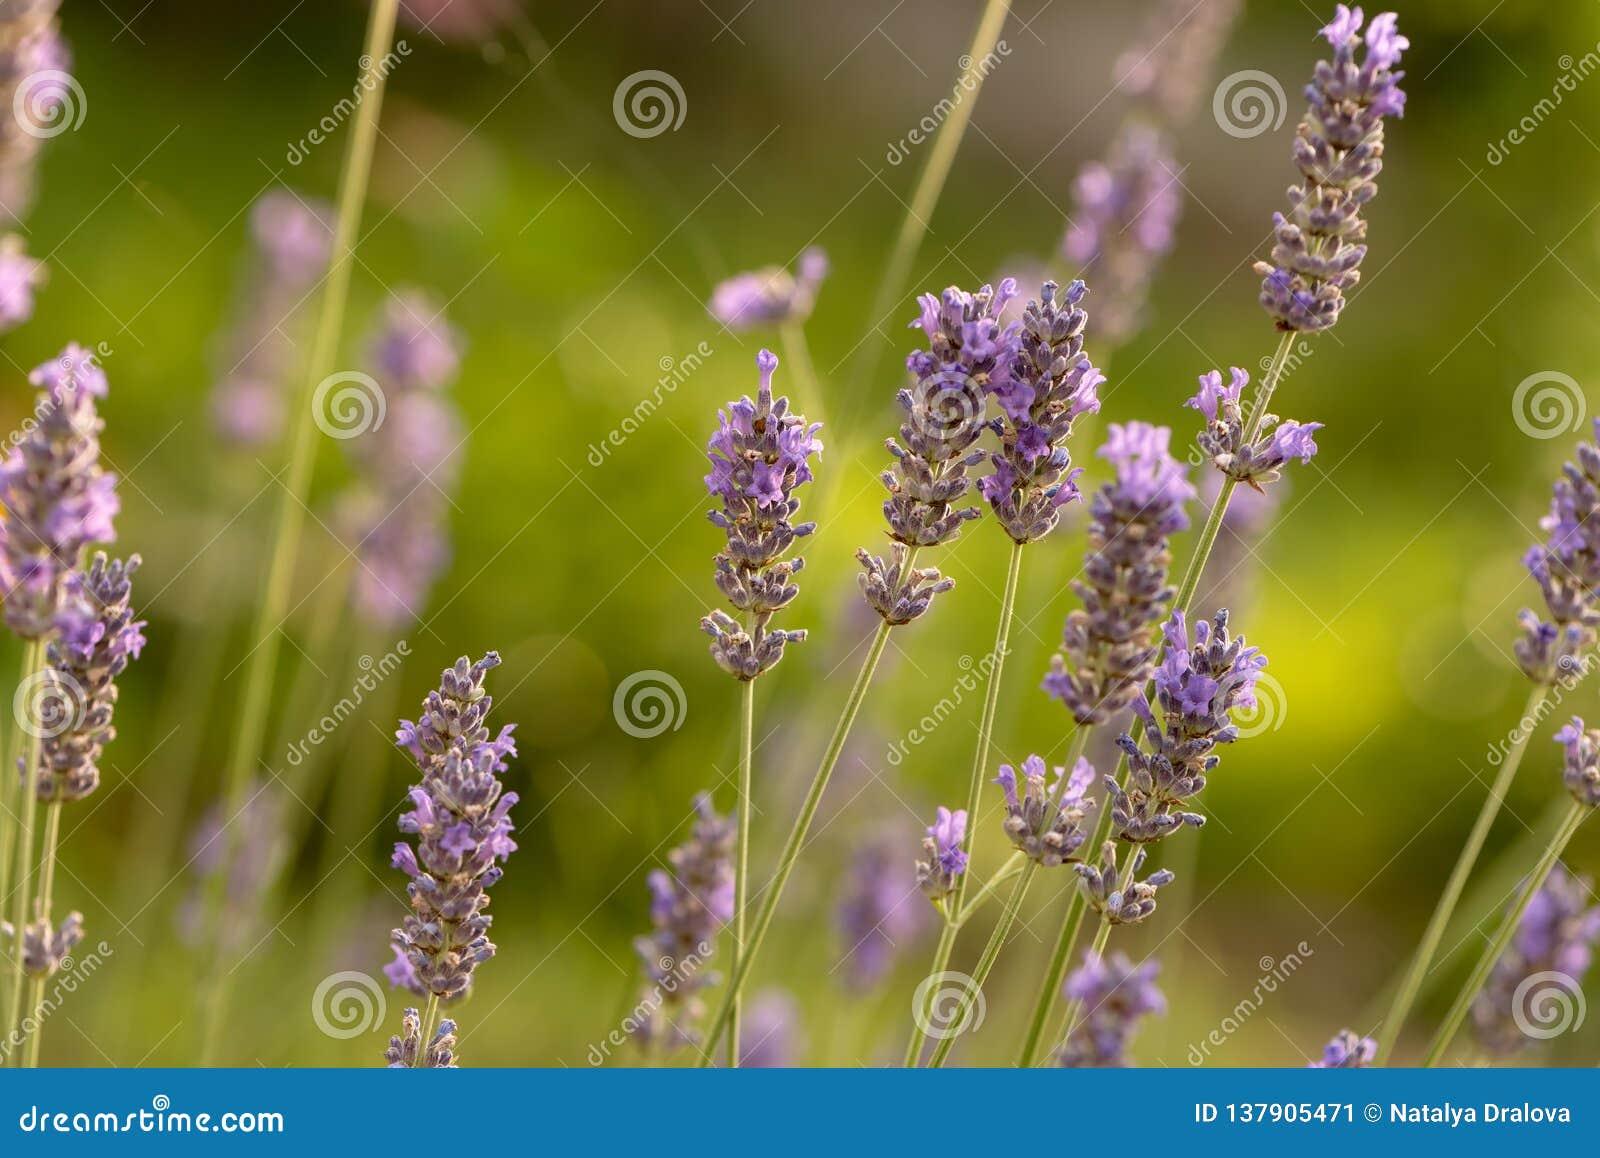 June is the season of lavender